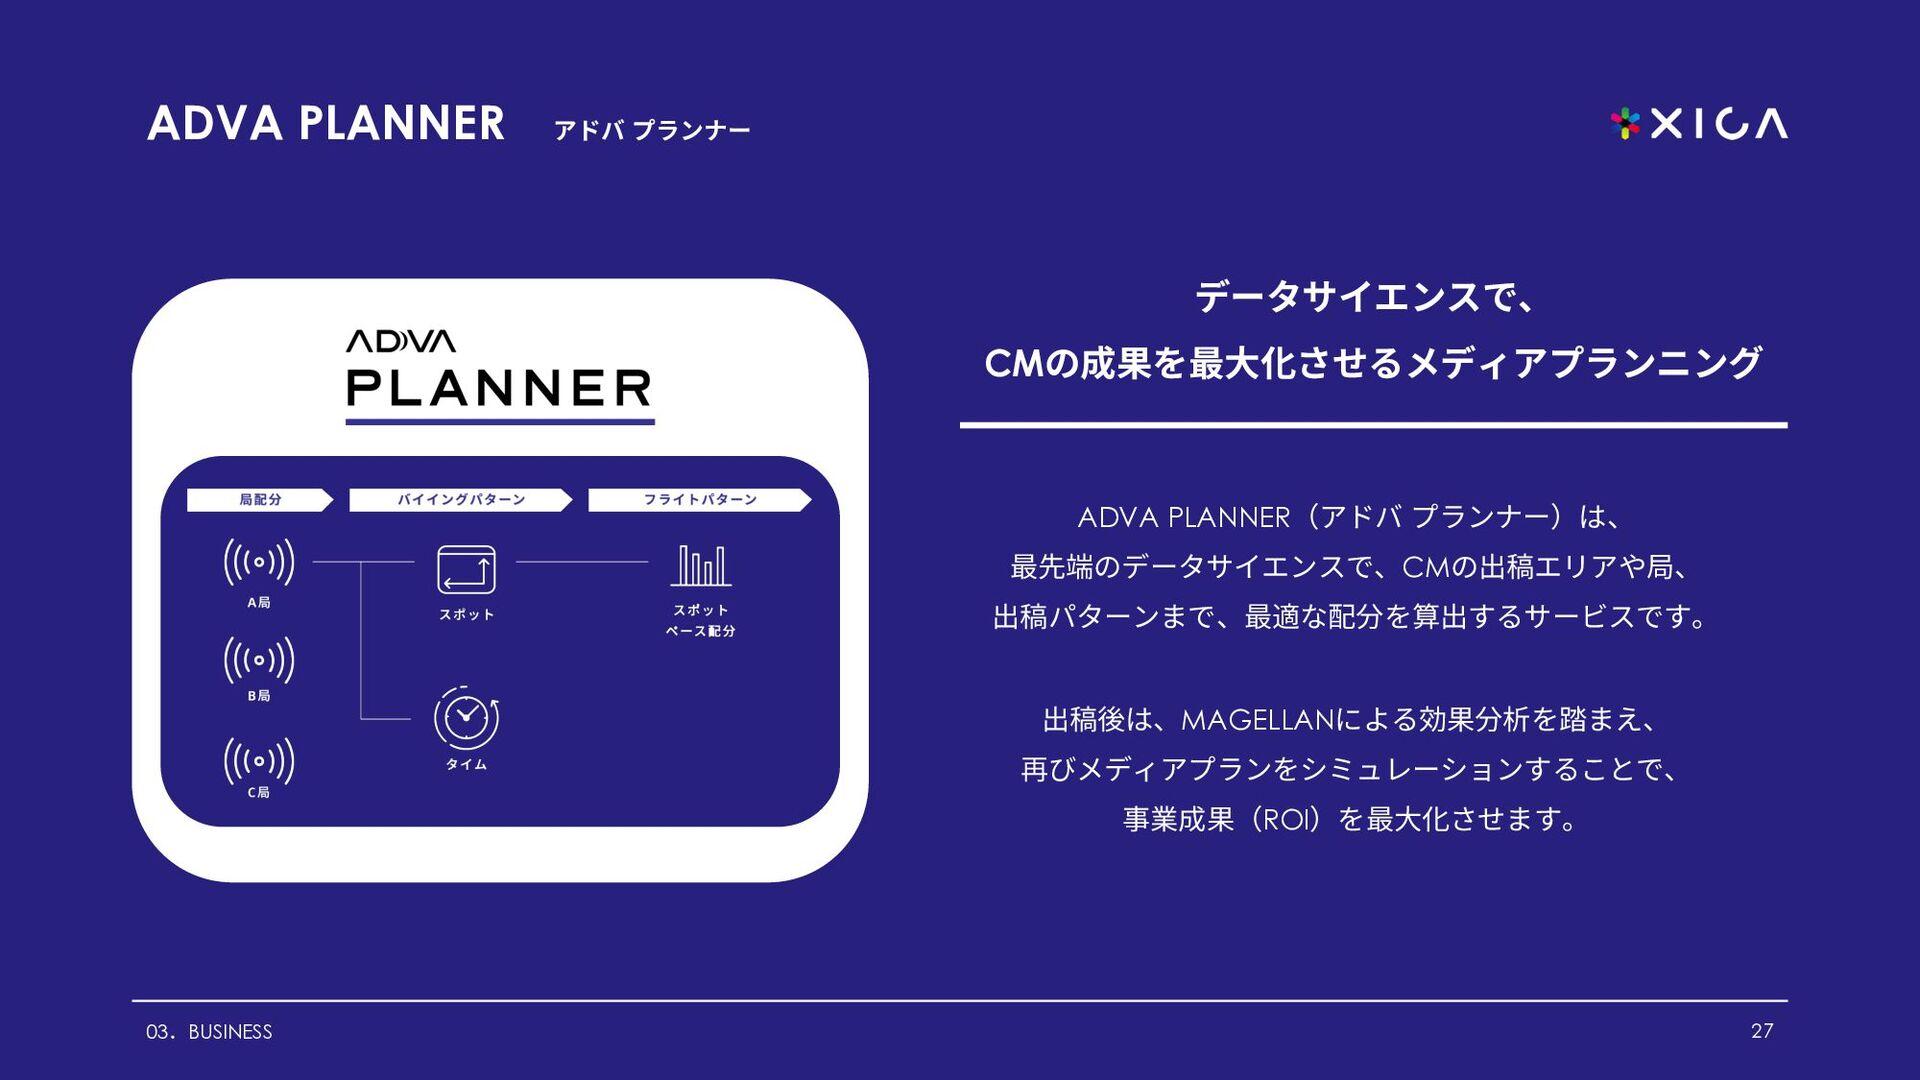 ADVA MAGELLAN実績 03.BUSINESS 27 広告宣伝費トップ100社のうち ...